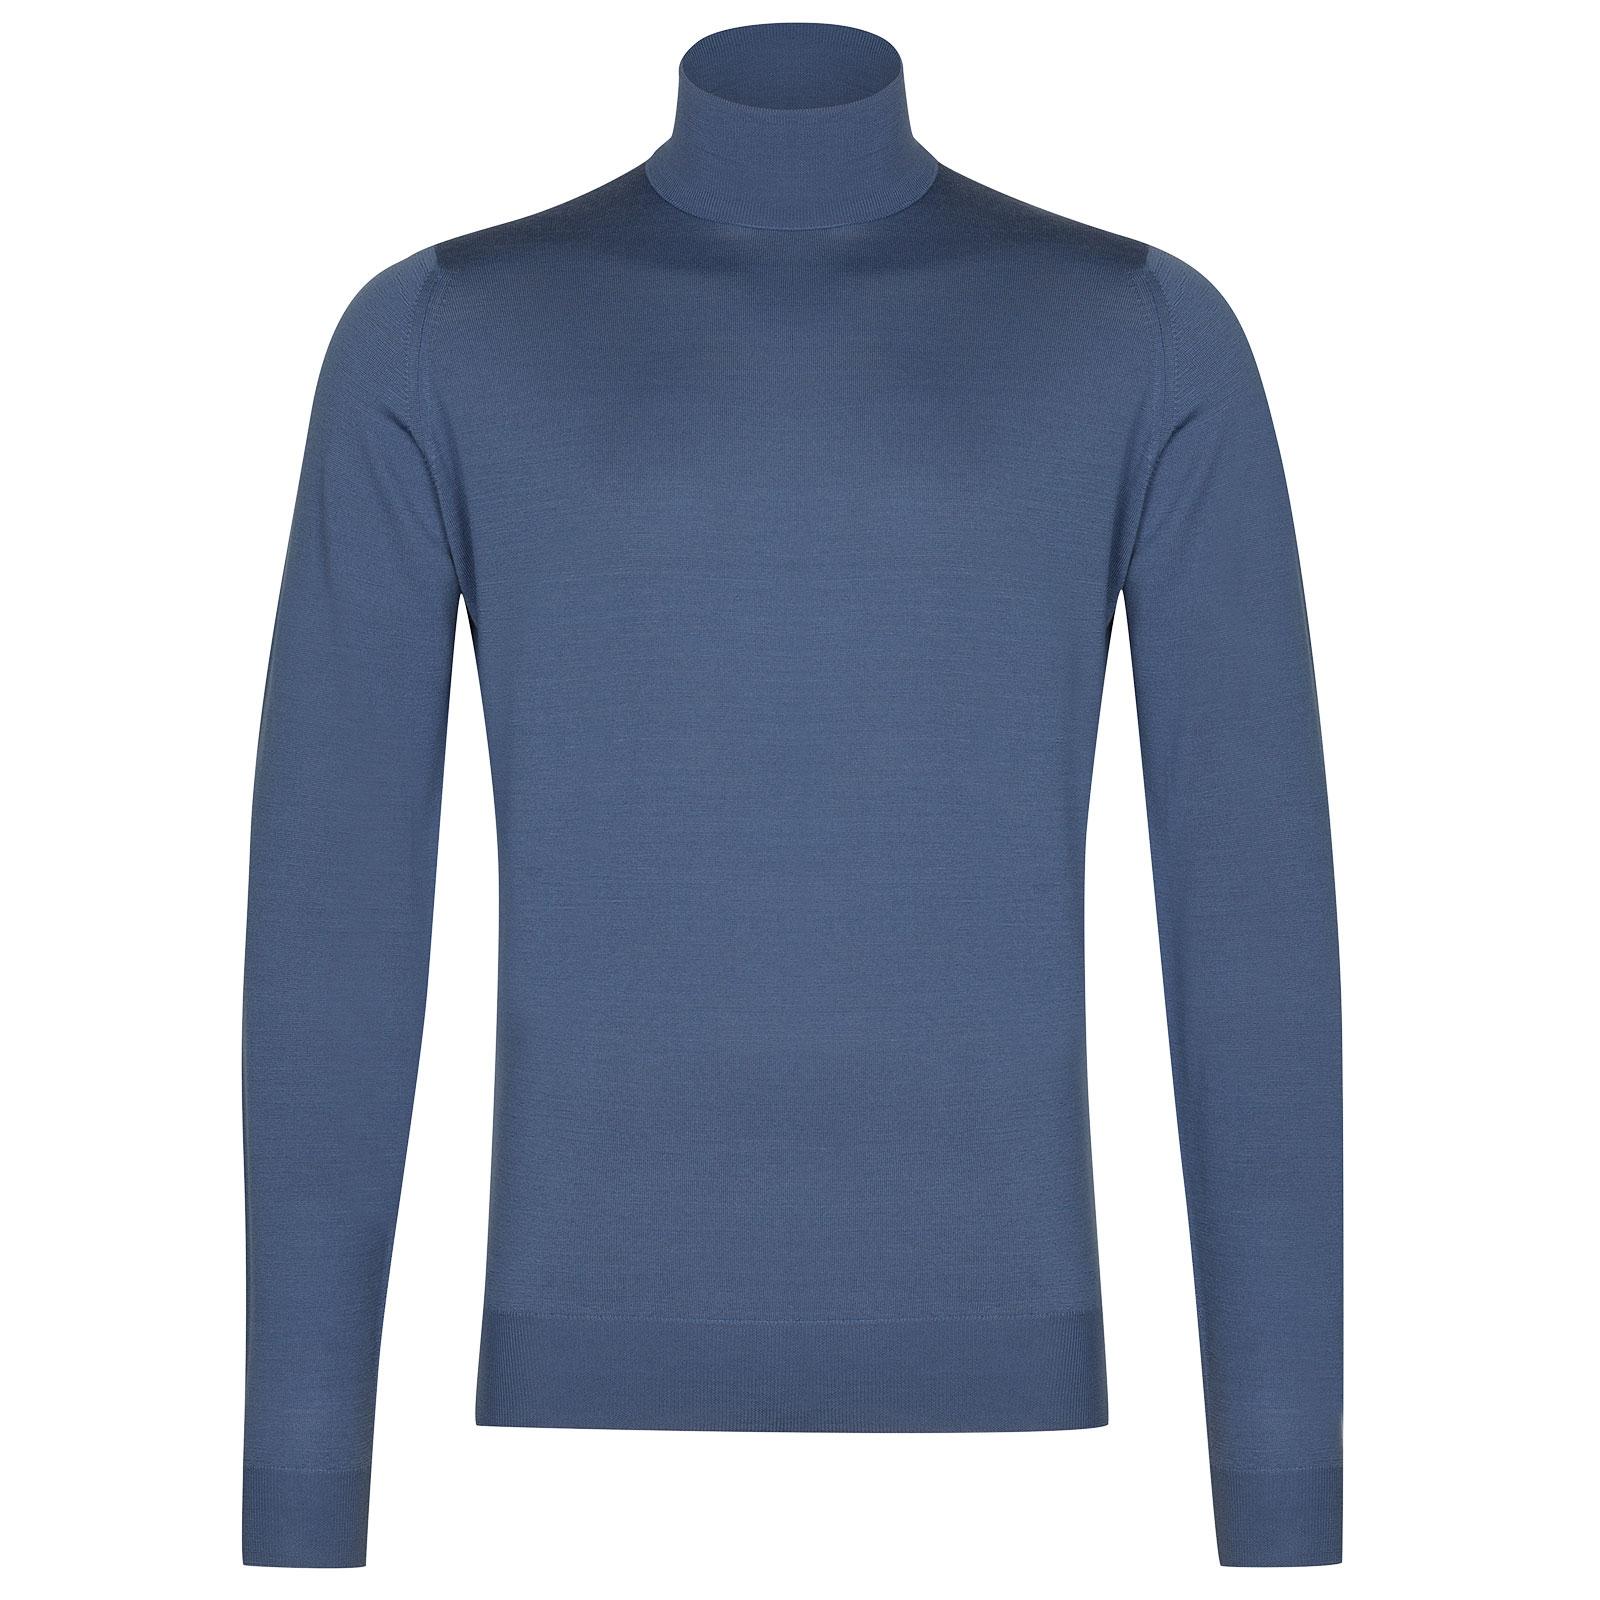 John Smedley Cherwell in Blue Iris Pullover-MED